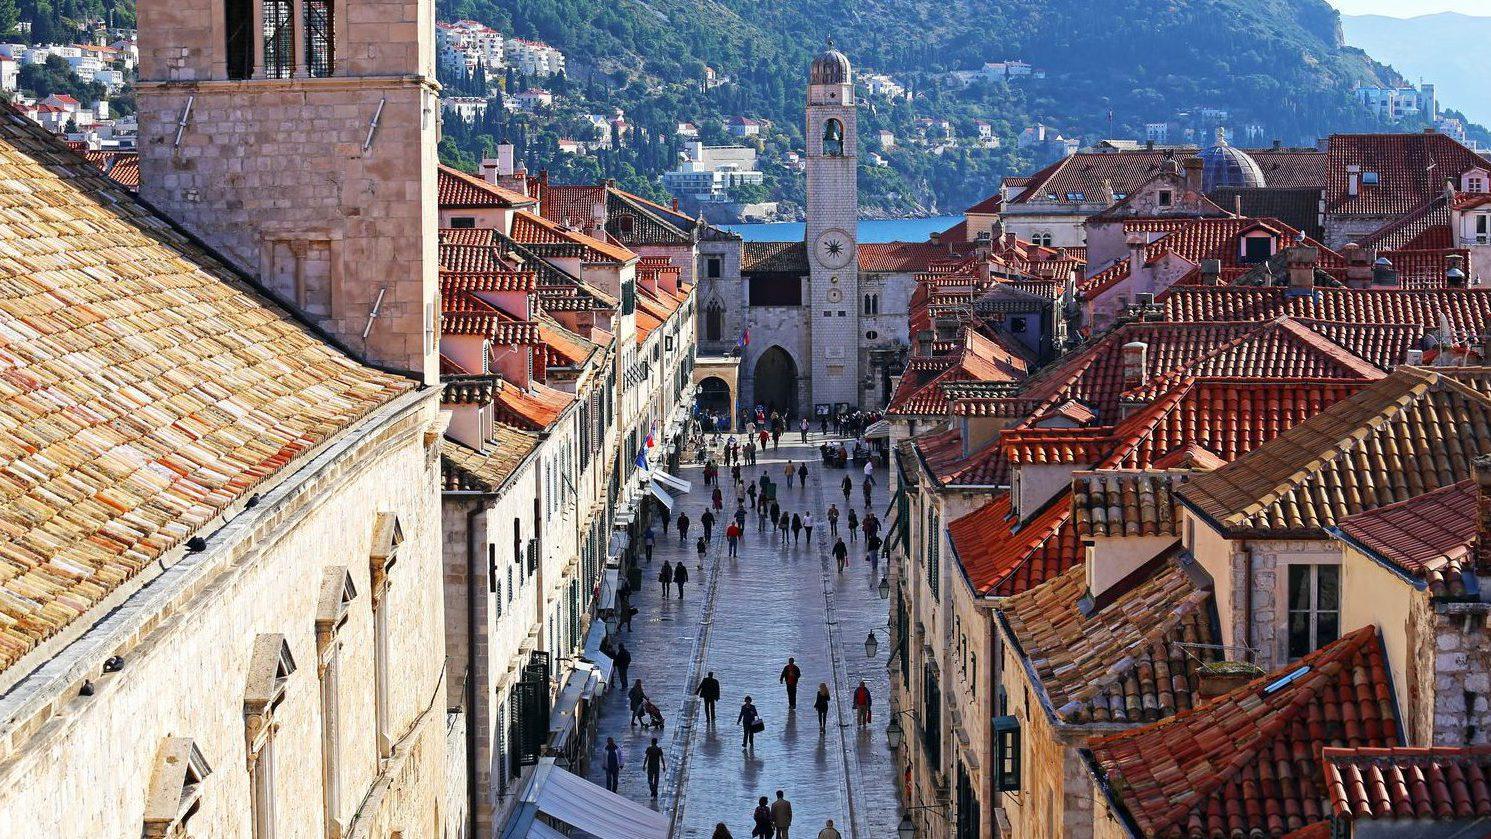 Dubrovnik, Old town, Stradun